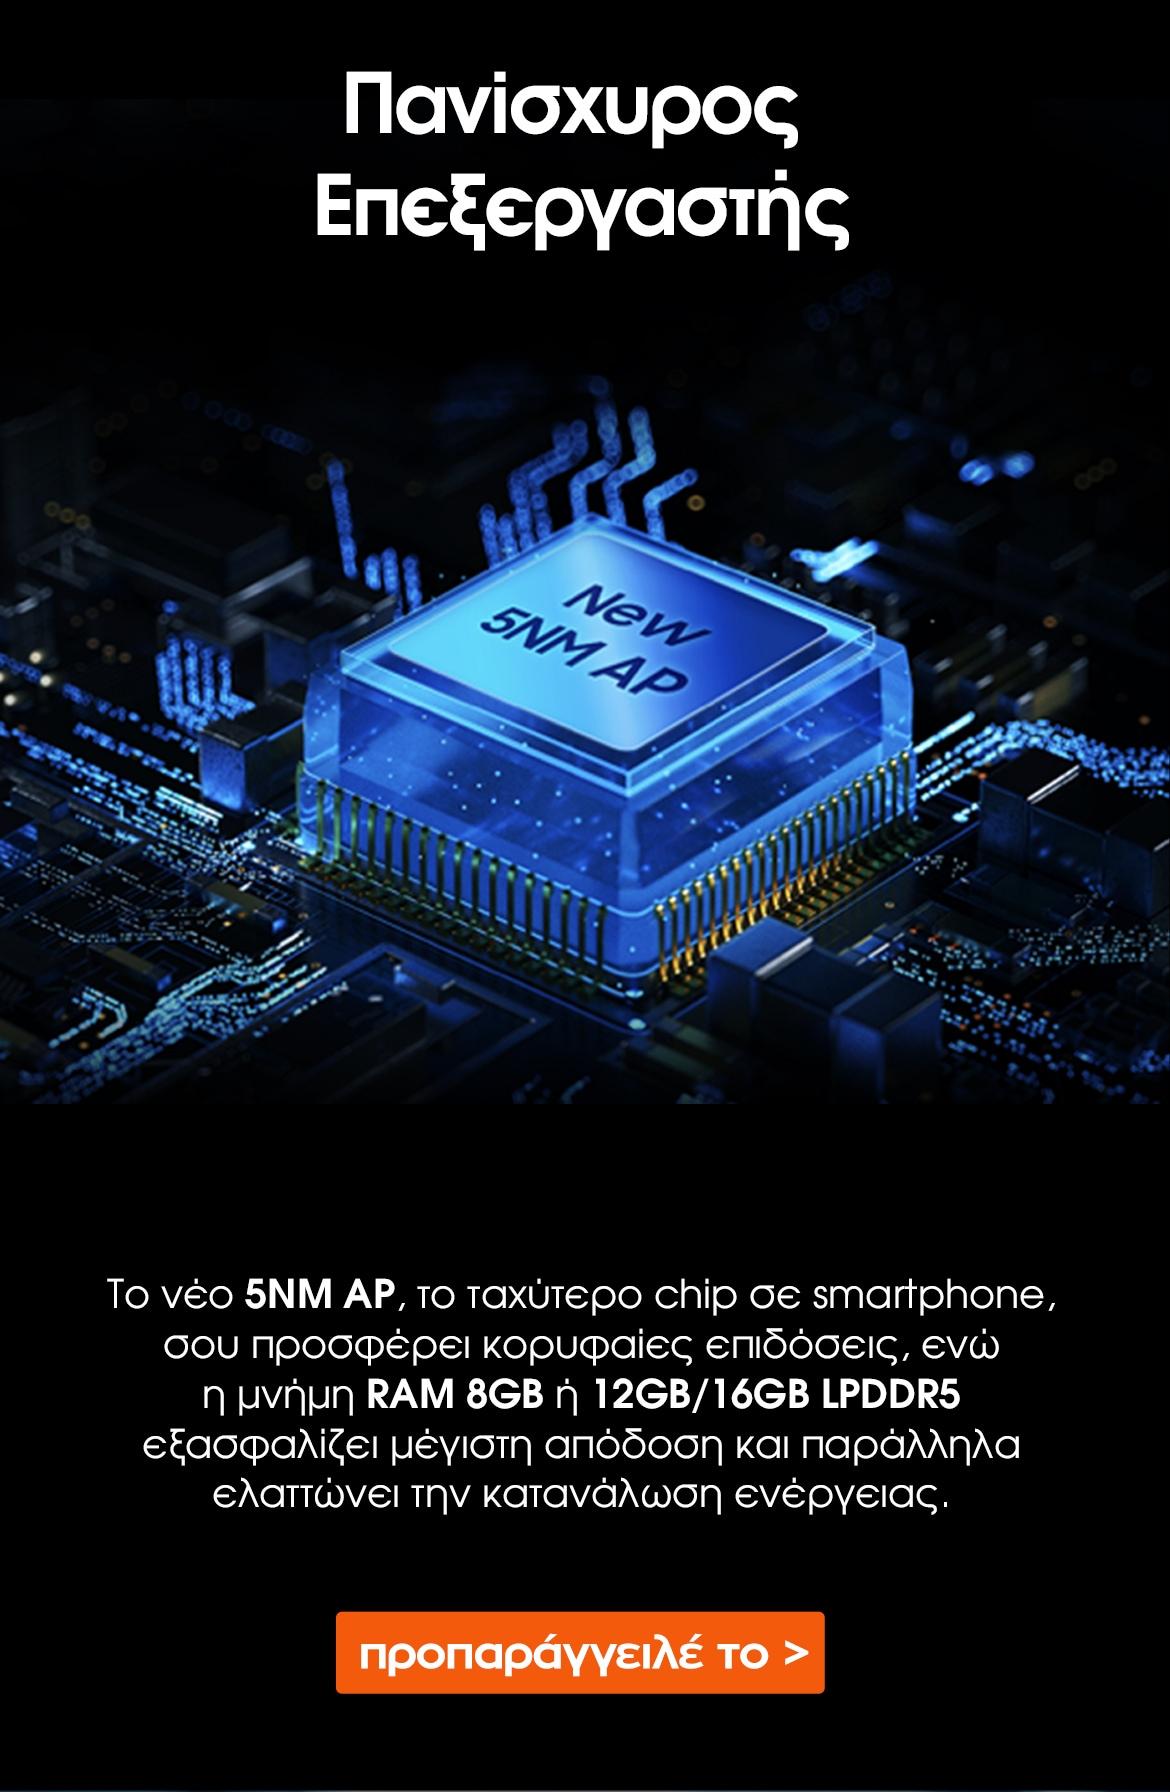 Samsung Galaxy S21 | Πανίσχυρος επεξεργαστής